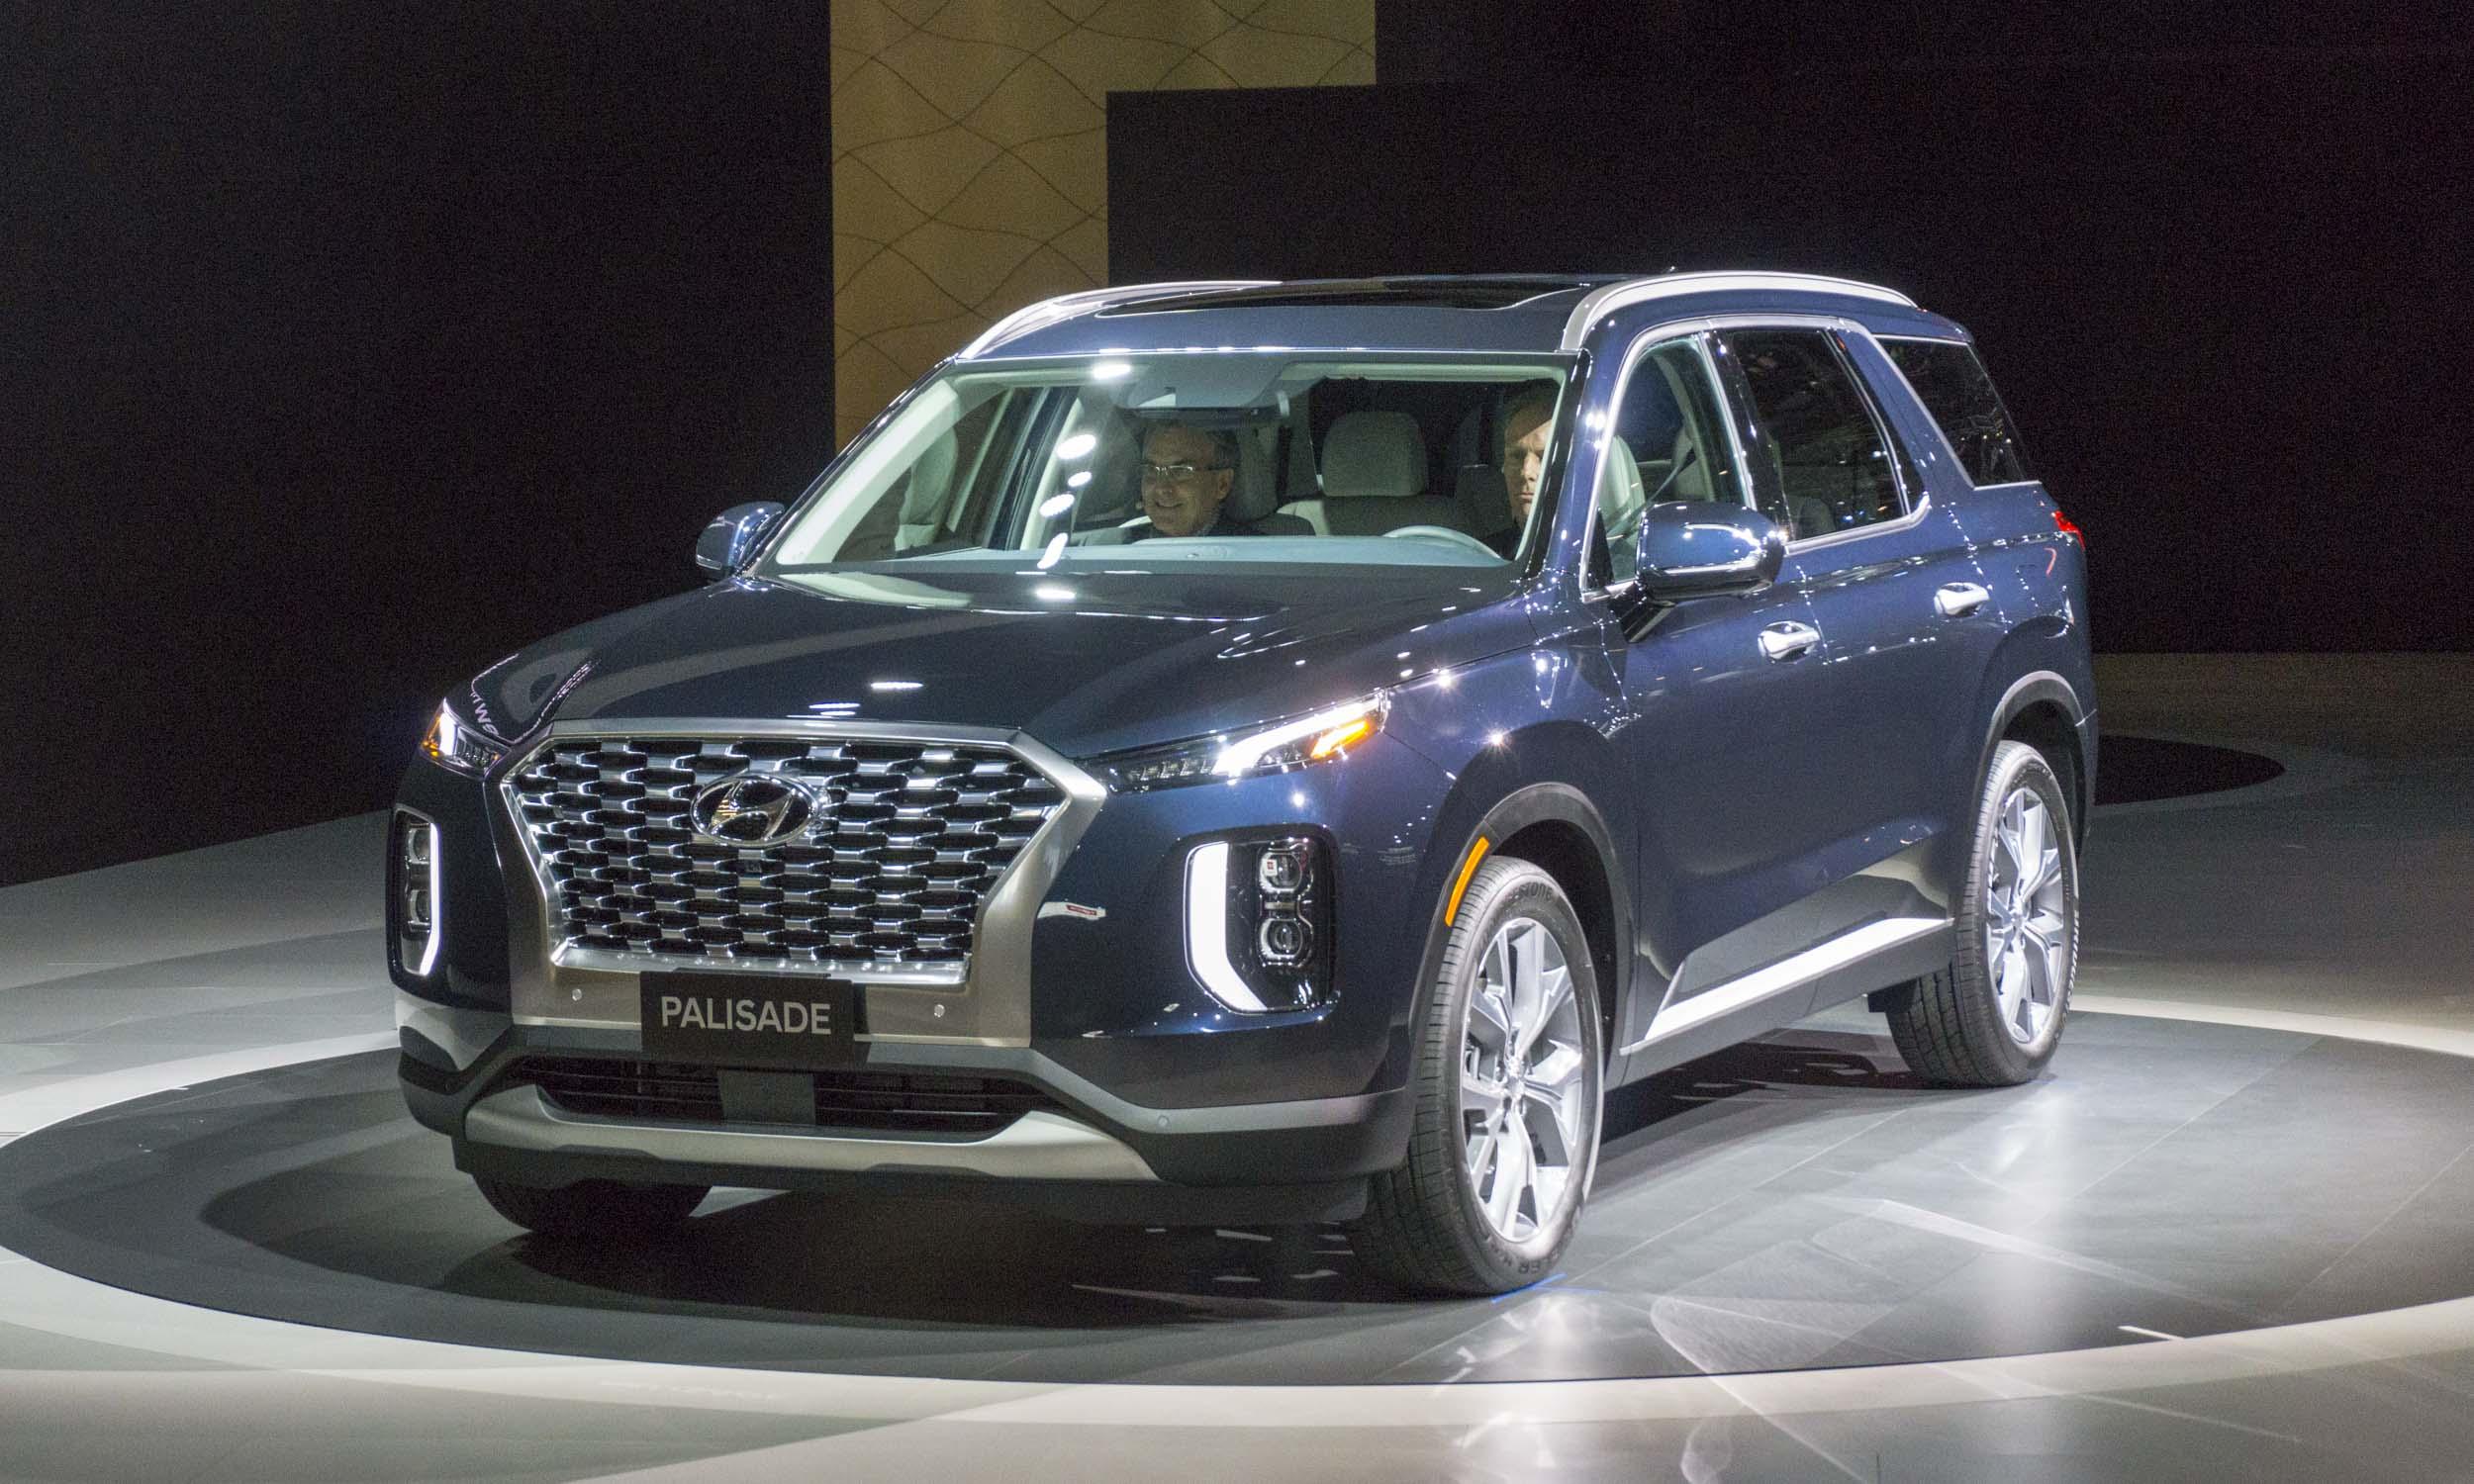 2018 L.A. Auto Show: 2020 Hyundai Palisade Rocks L.A.